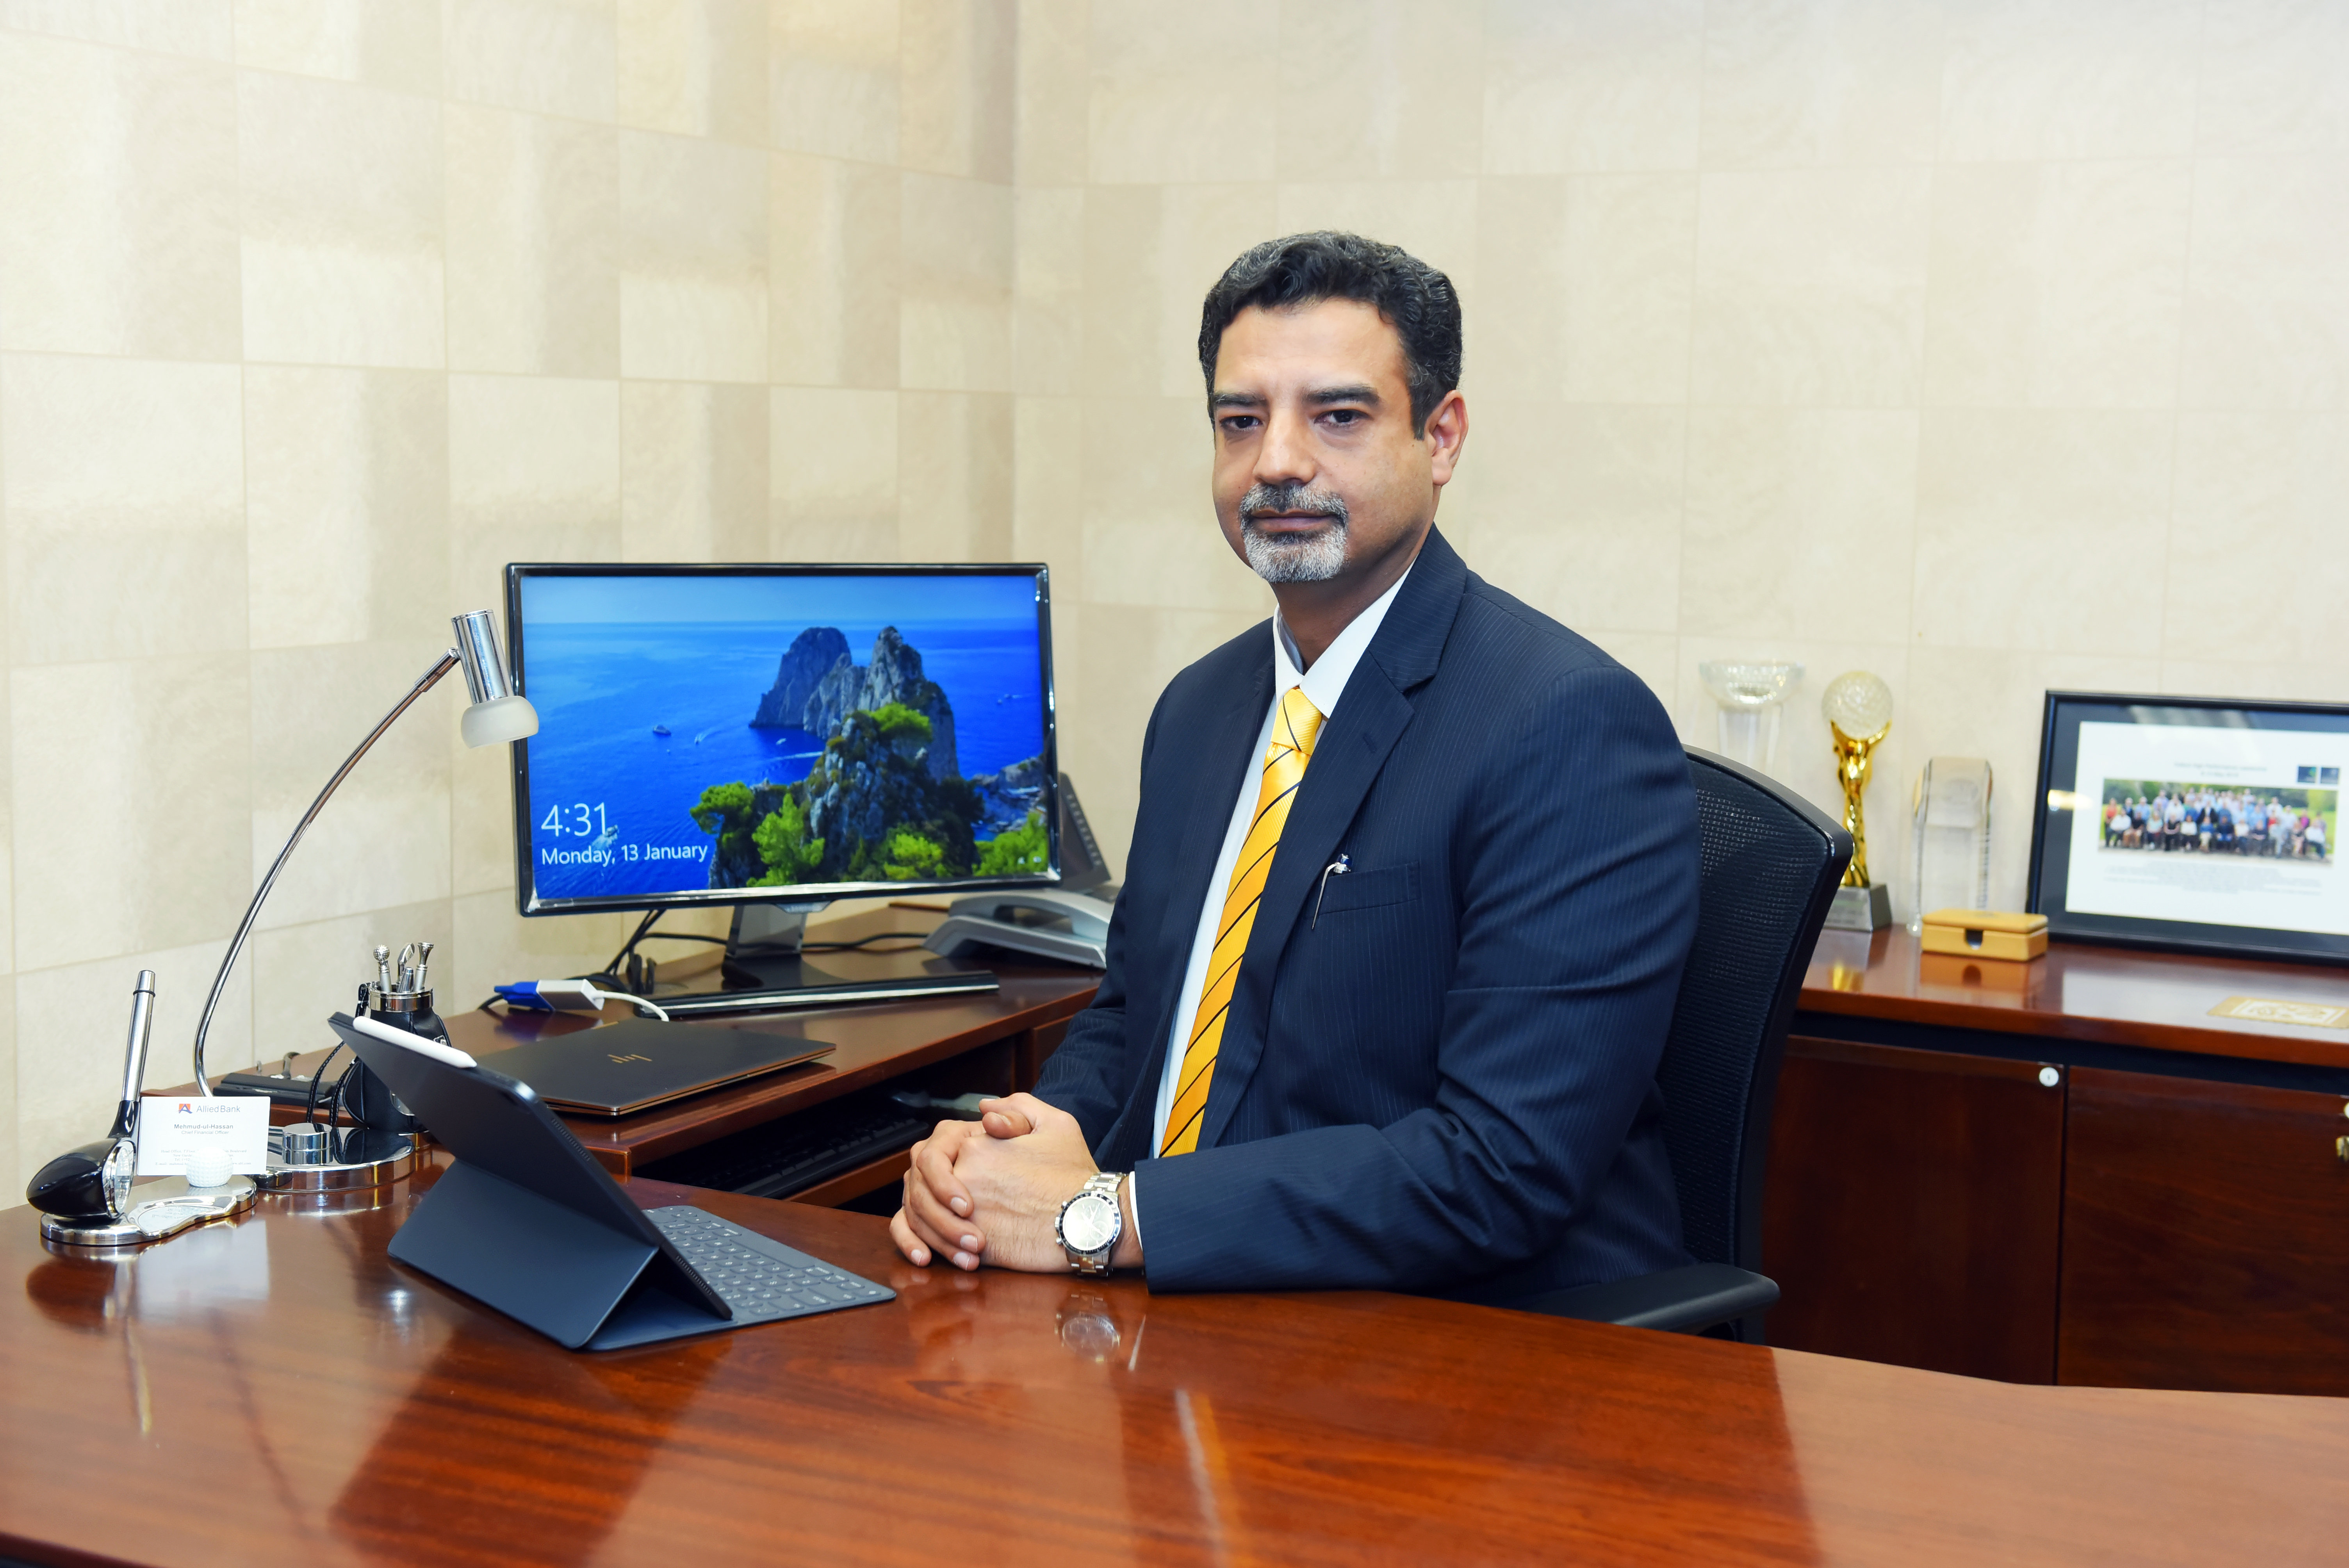 Mehmud ul Hassan